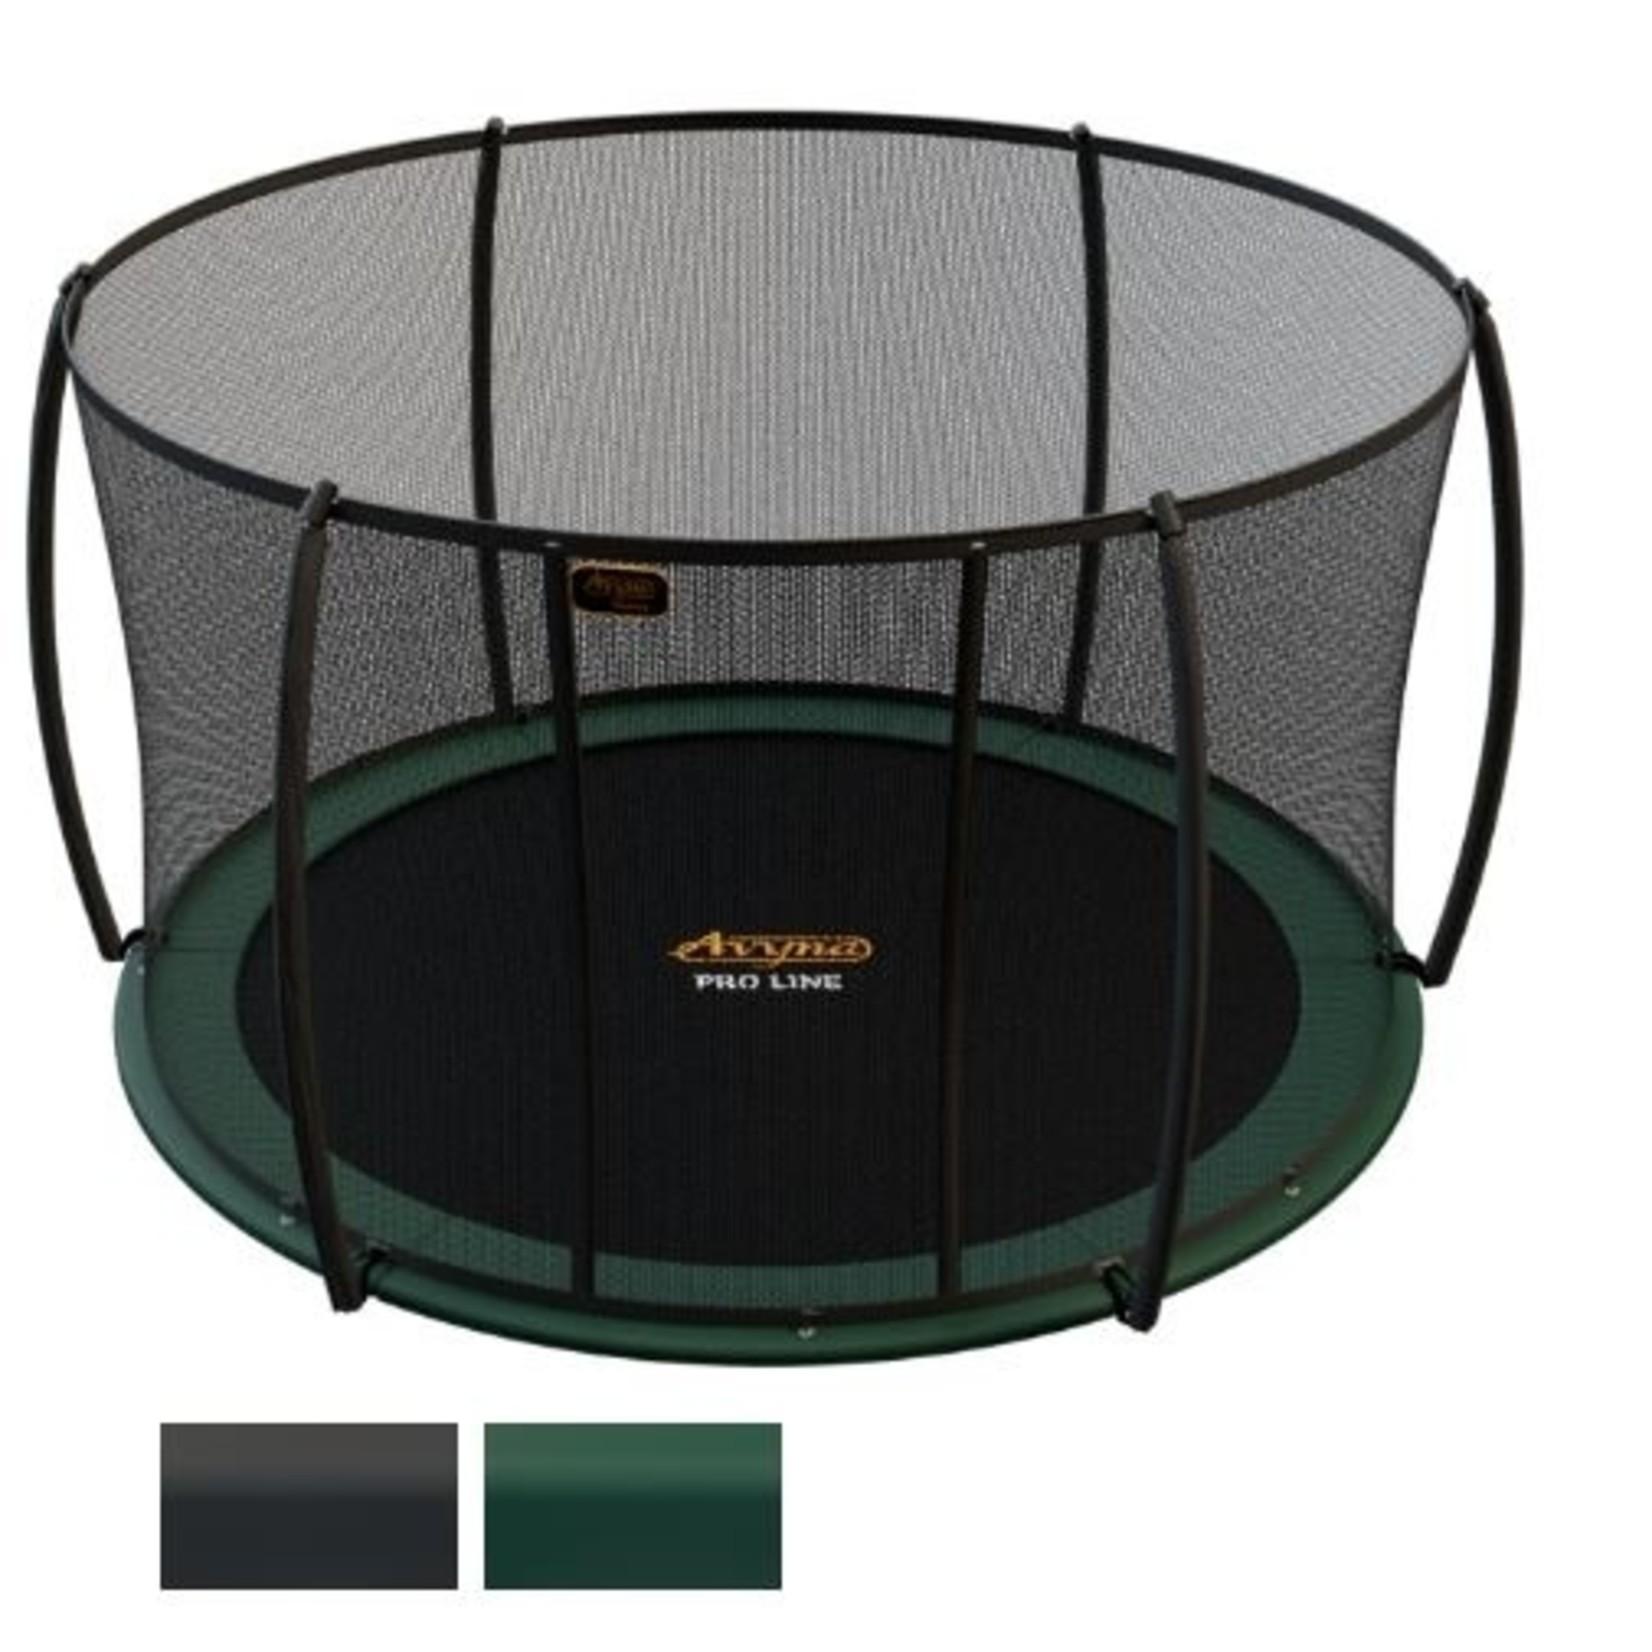 Ronde trampoline | Avyna Pro-Line FlatLevel Ø 245 cm